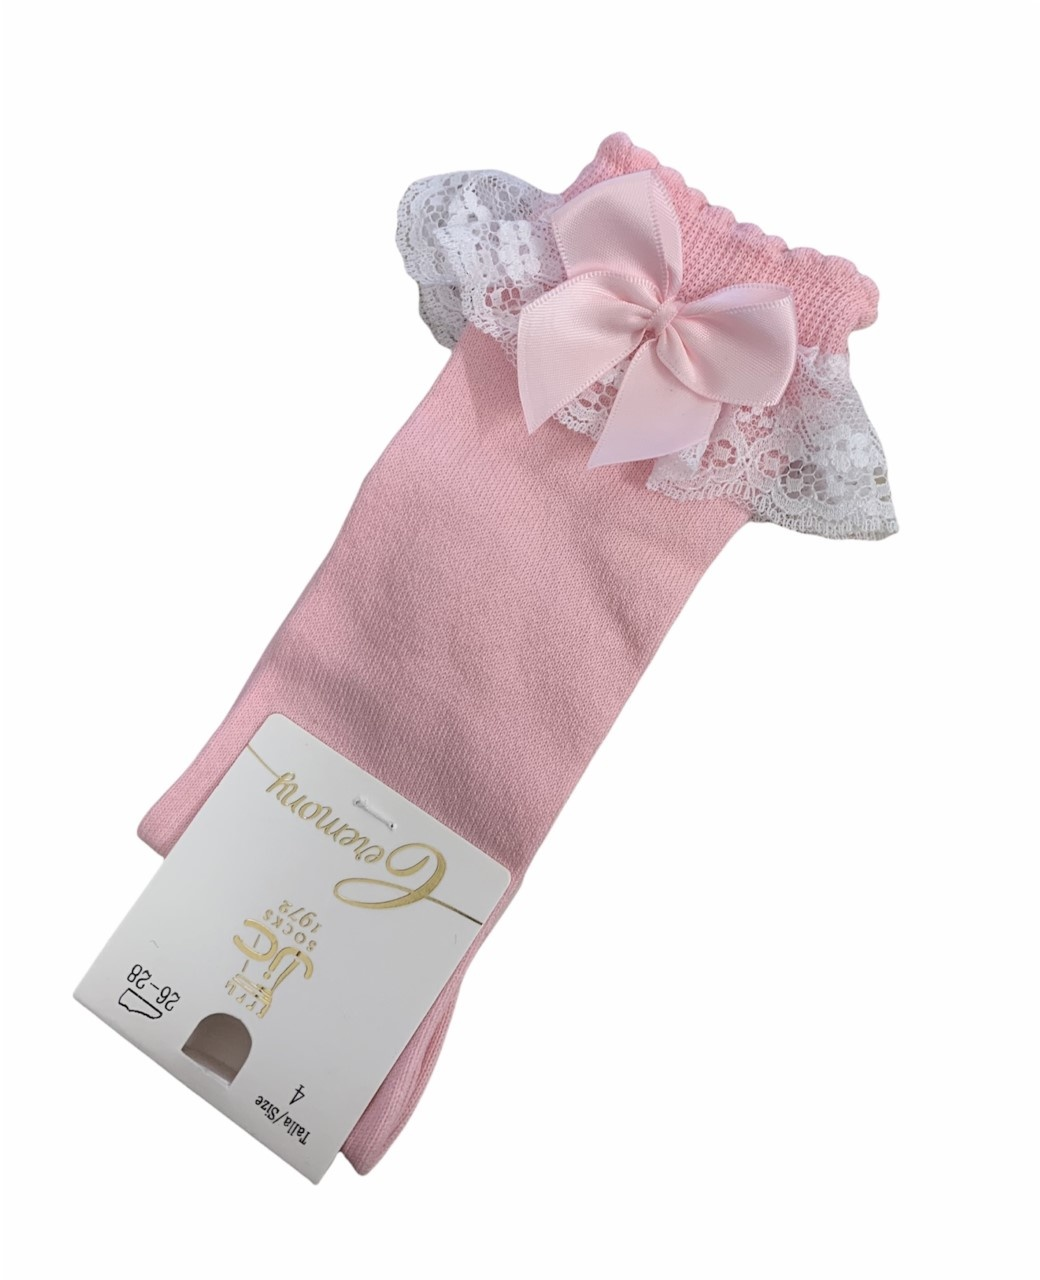 JC Socks JC Socks 56300 Pink Lace Frill Sock With Bow